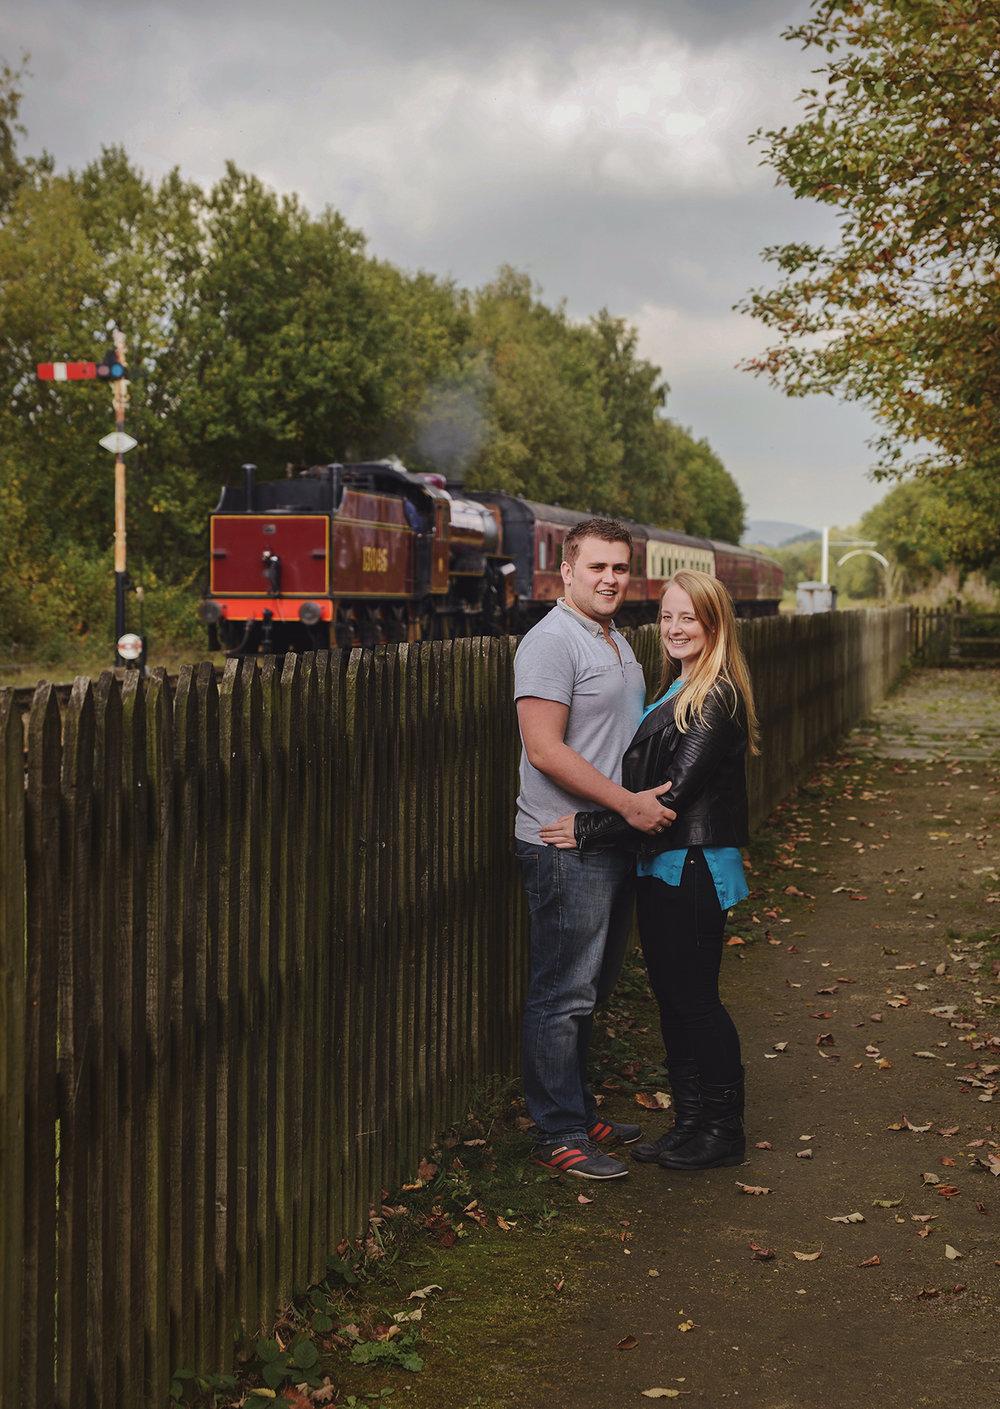 ramsbottom-train-steam-photography-bury.jpg